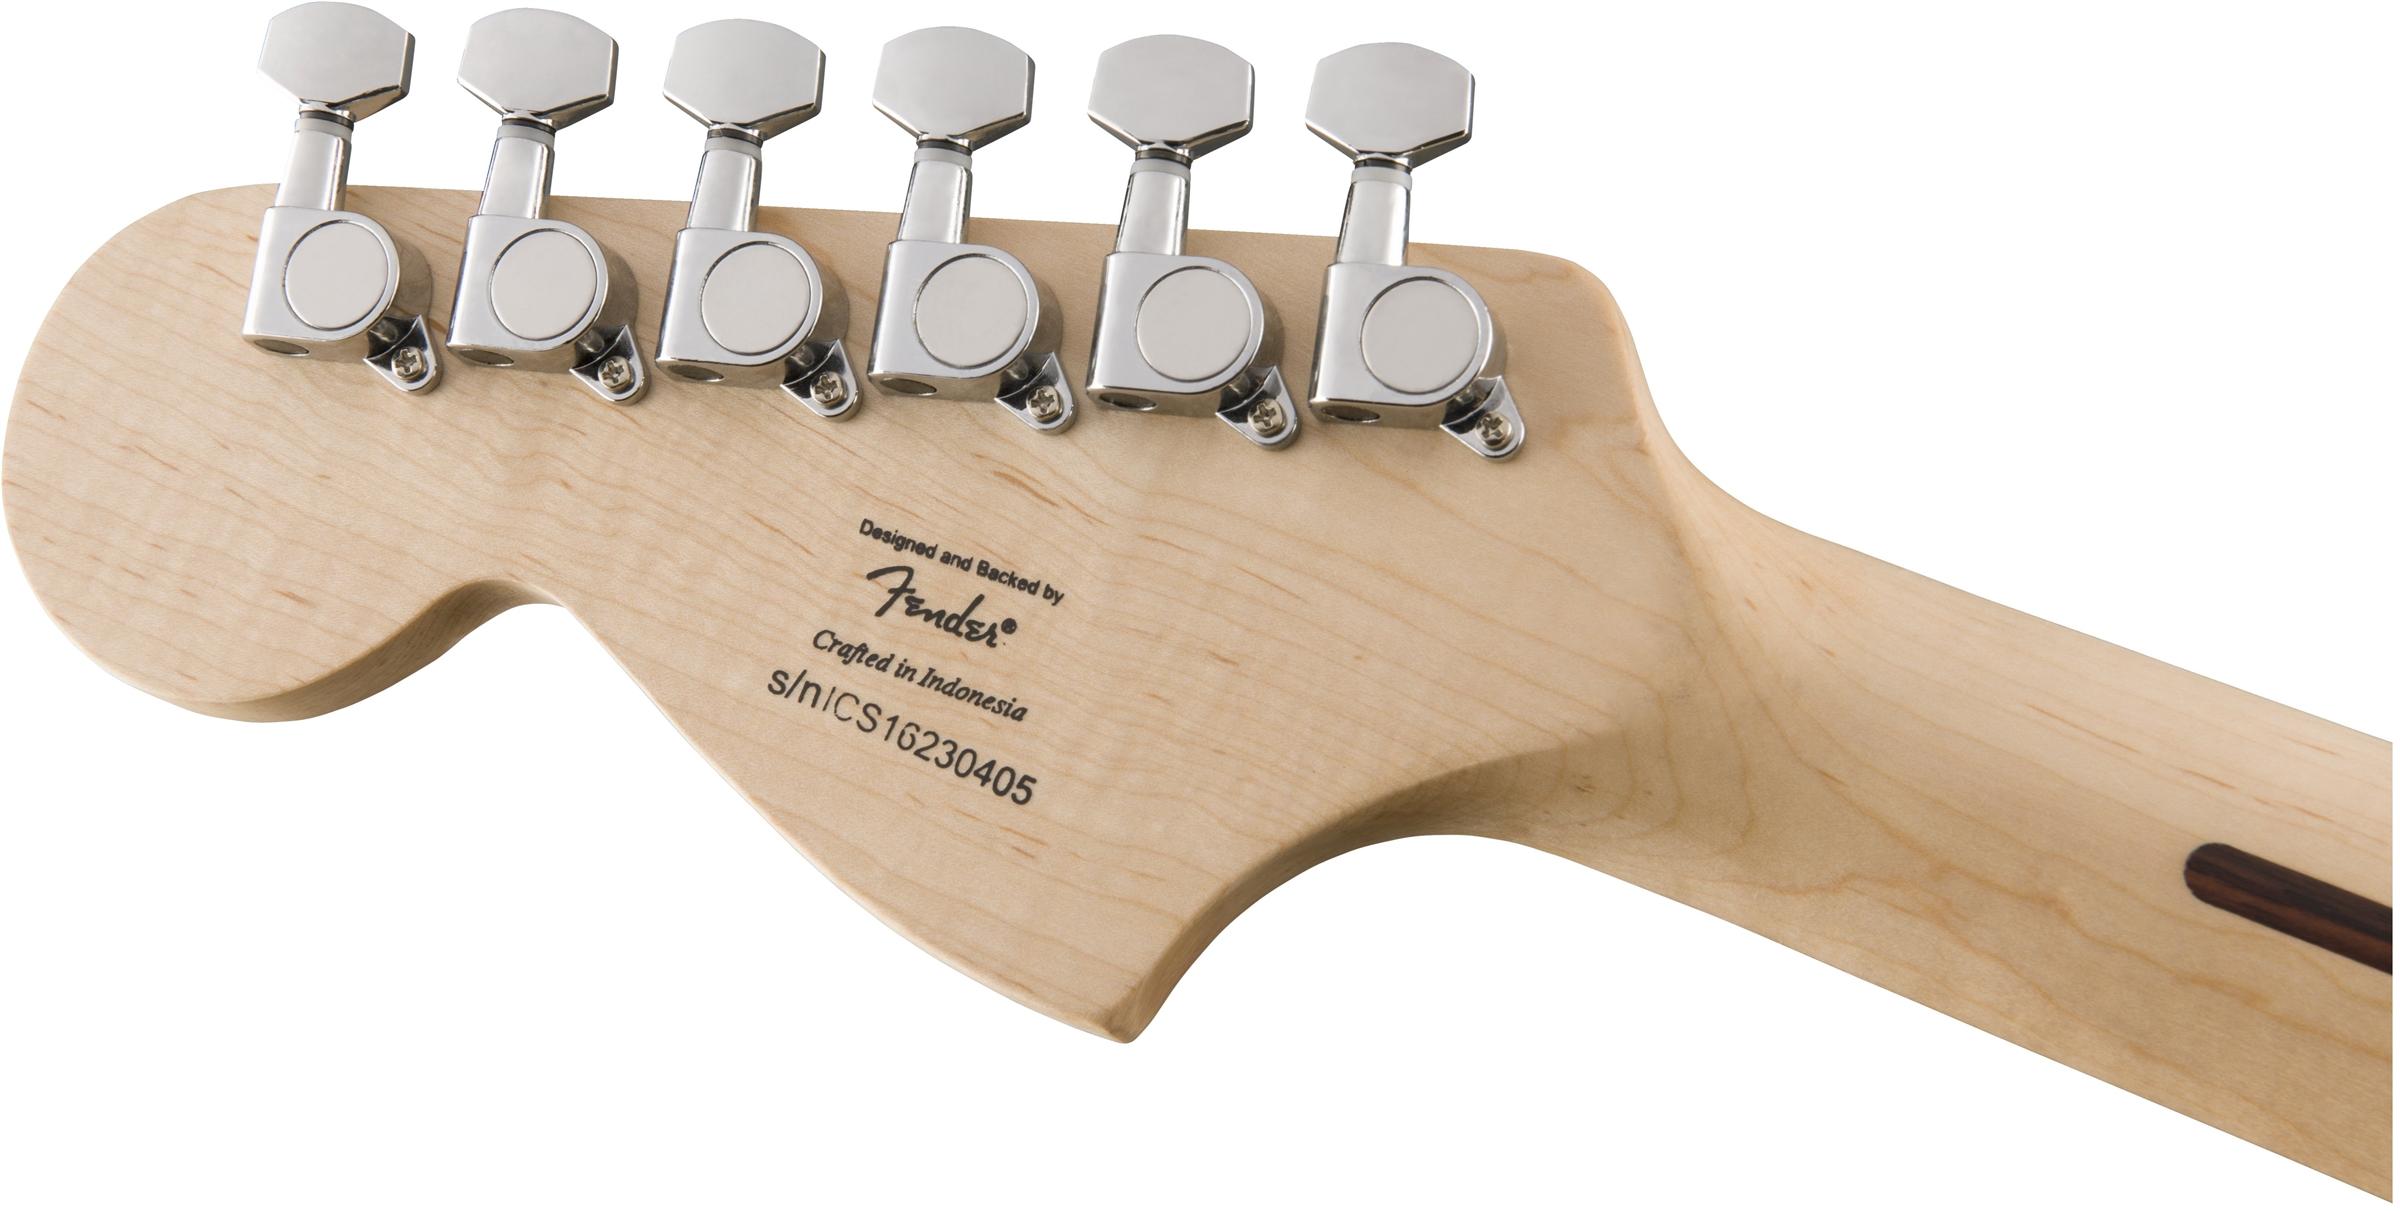 Bullet Mustang Hh Squier Electric Guitars Dean Pickup Wiring Diagram